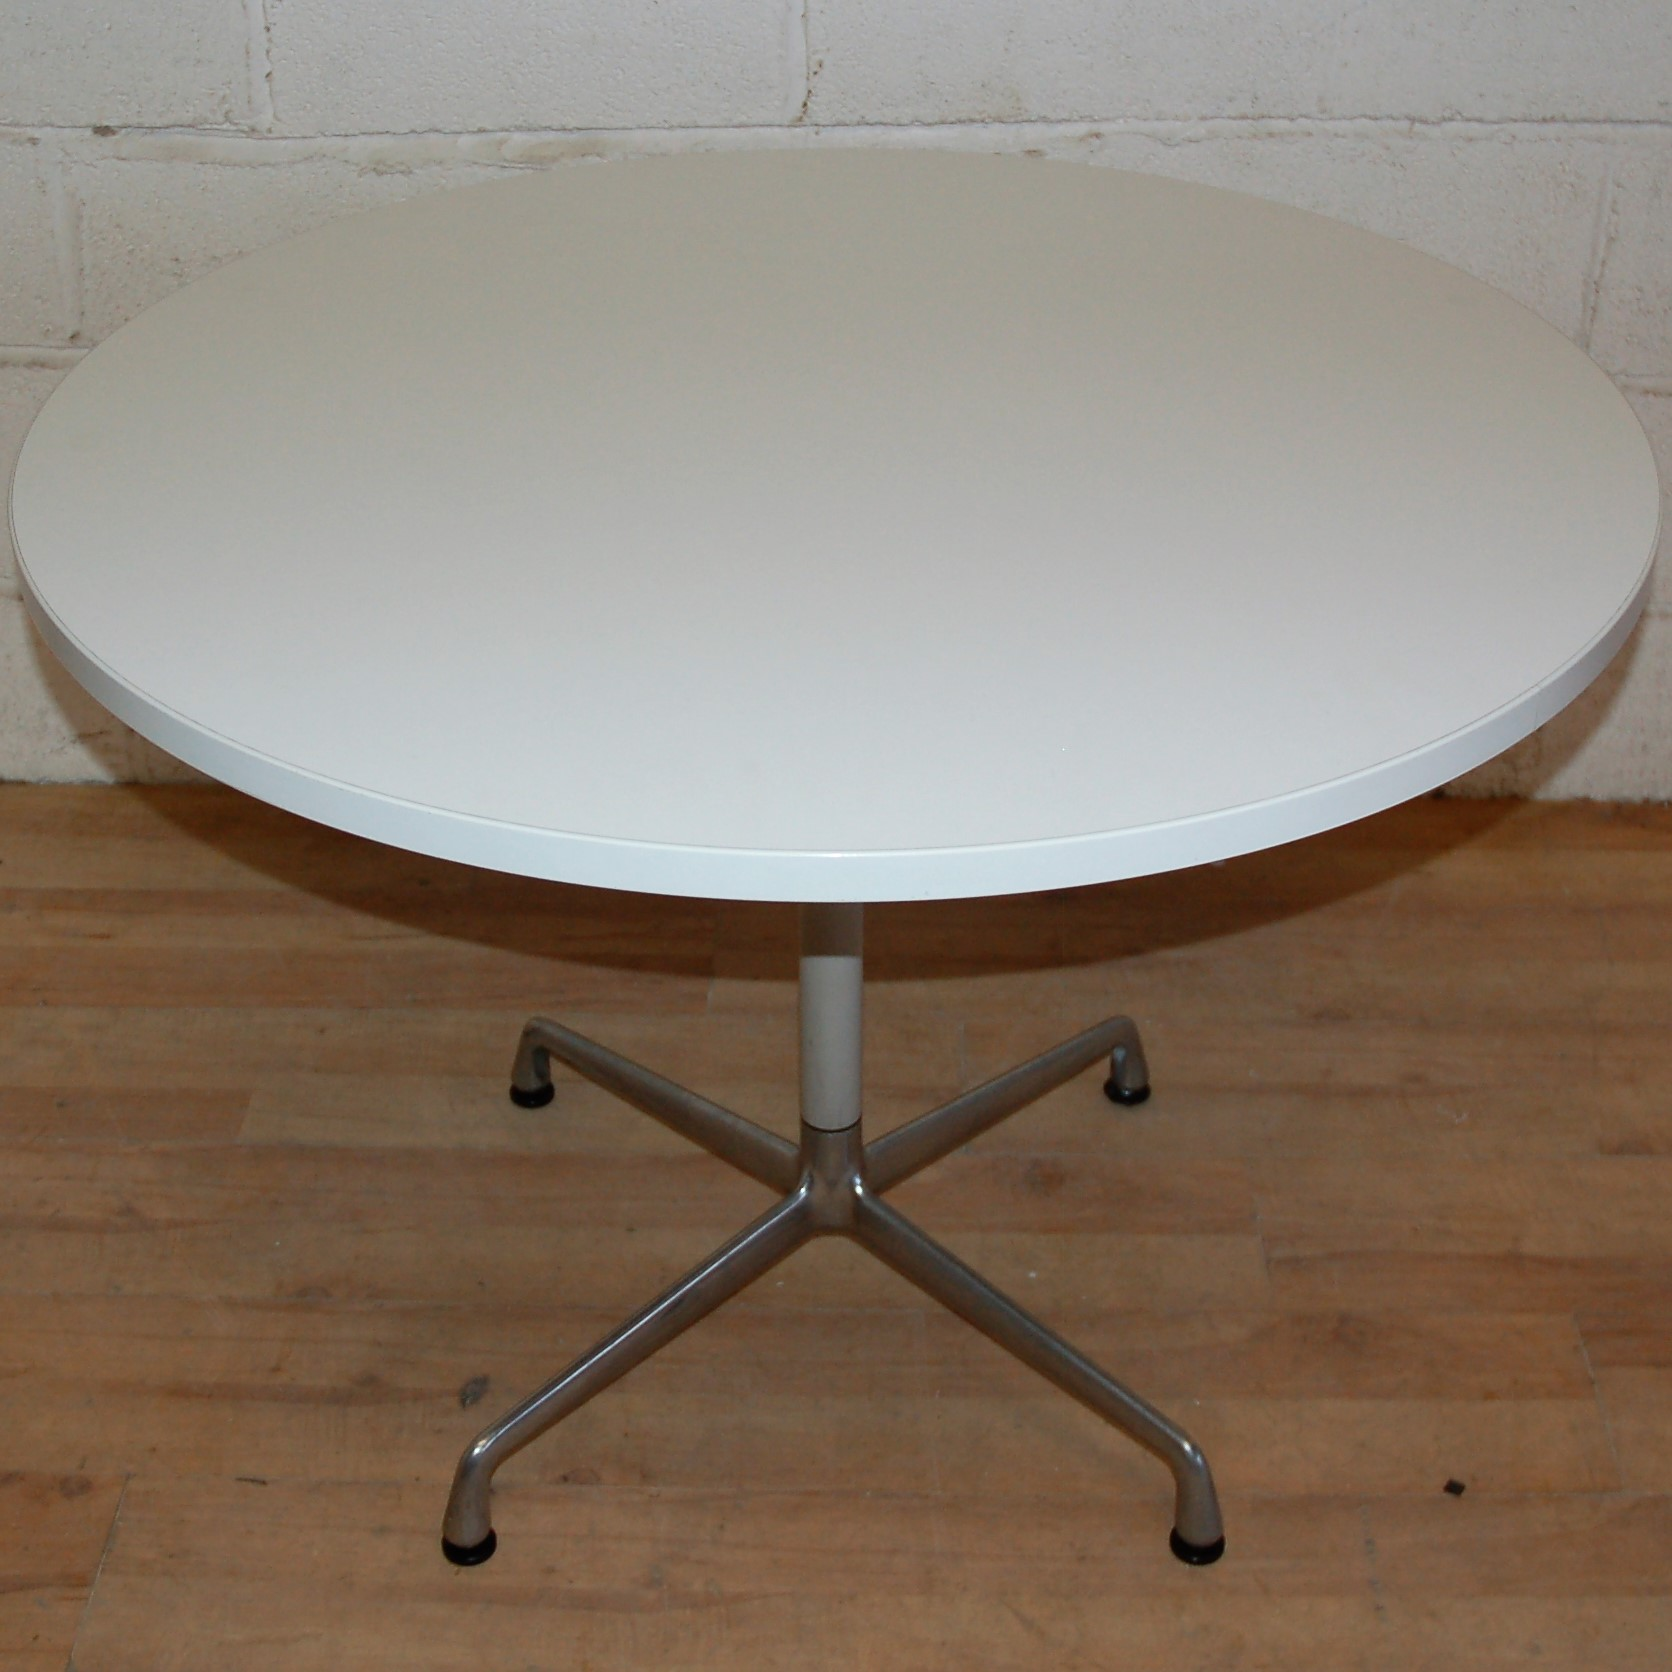 Herman miller eames circular table white 15034 - Eames table herman miller ...